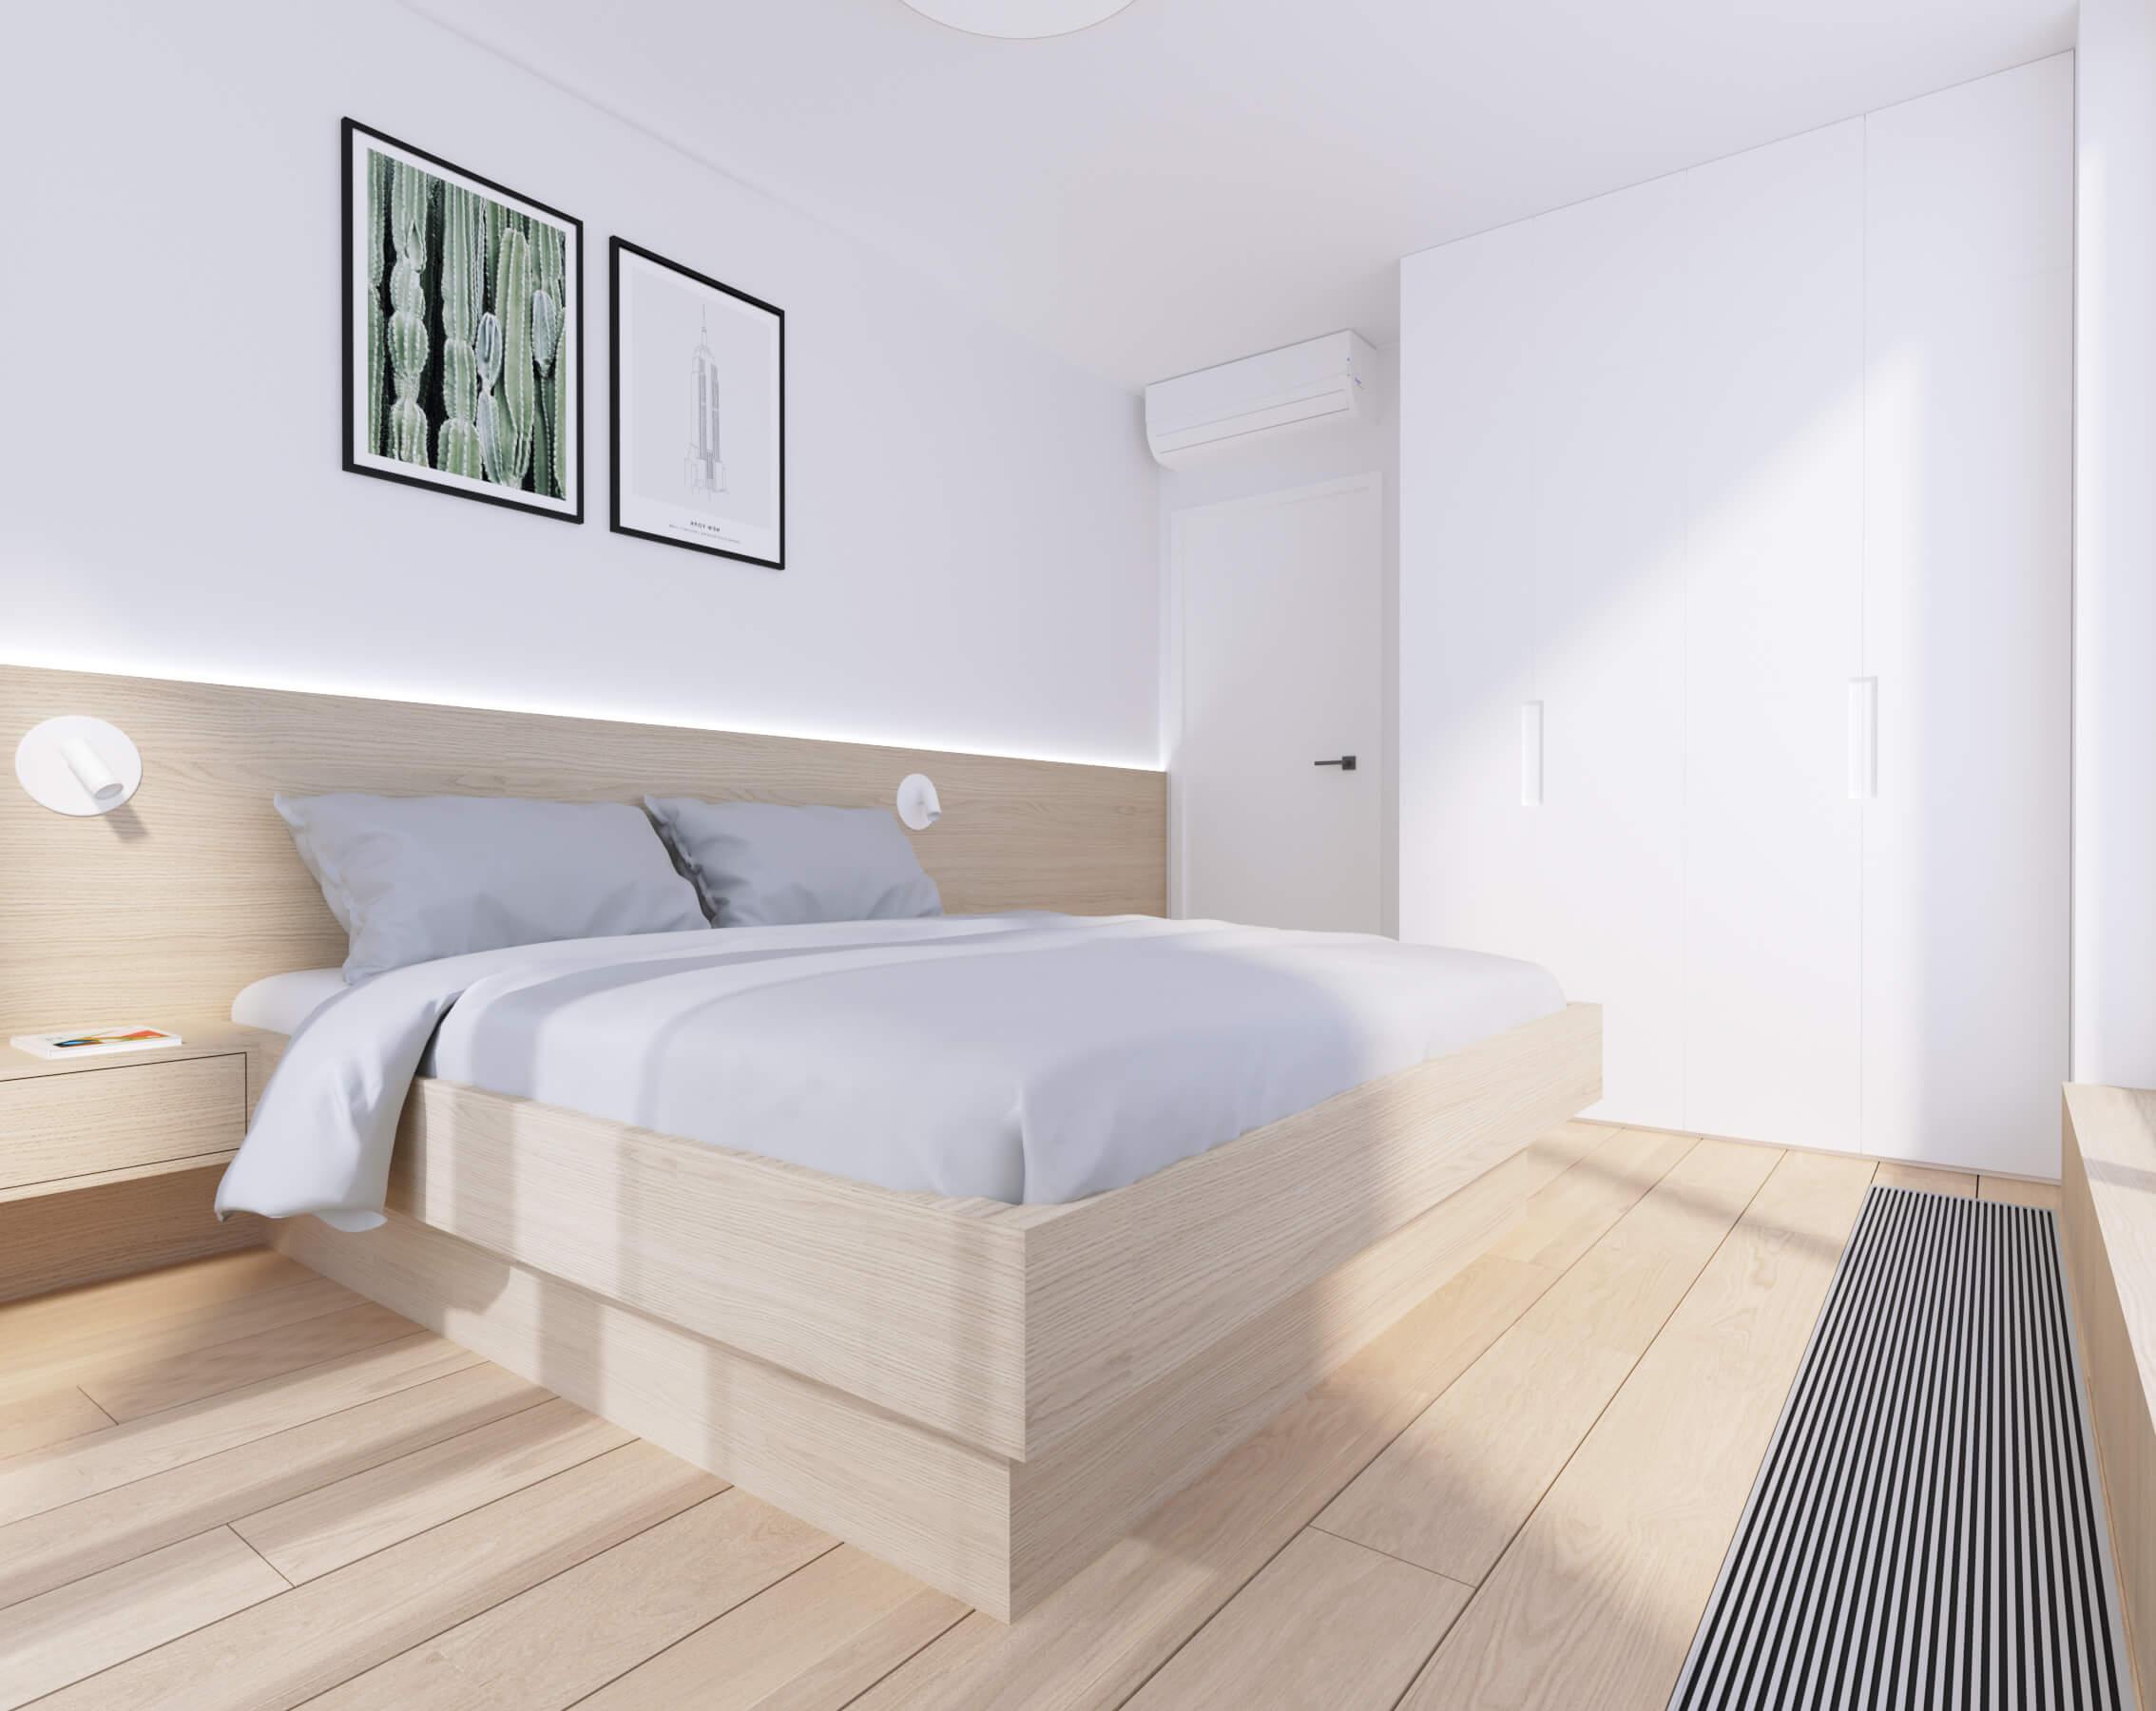 interierovy dizajn spálňa - byty Nido, Bratislava